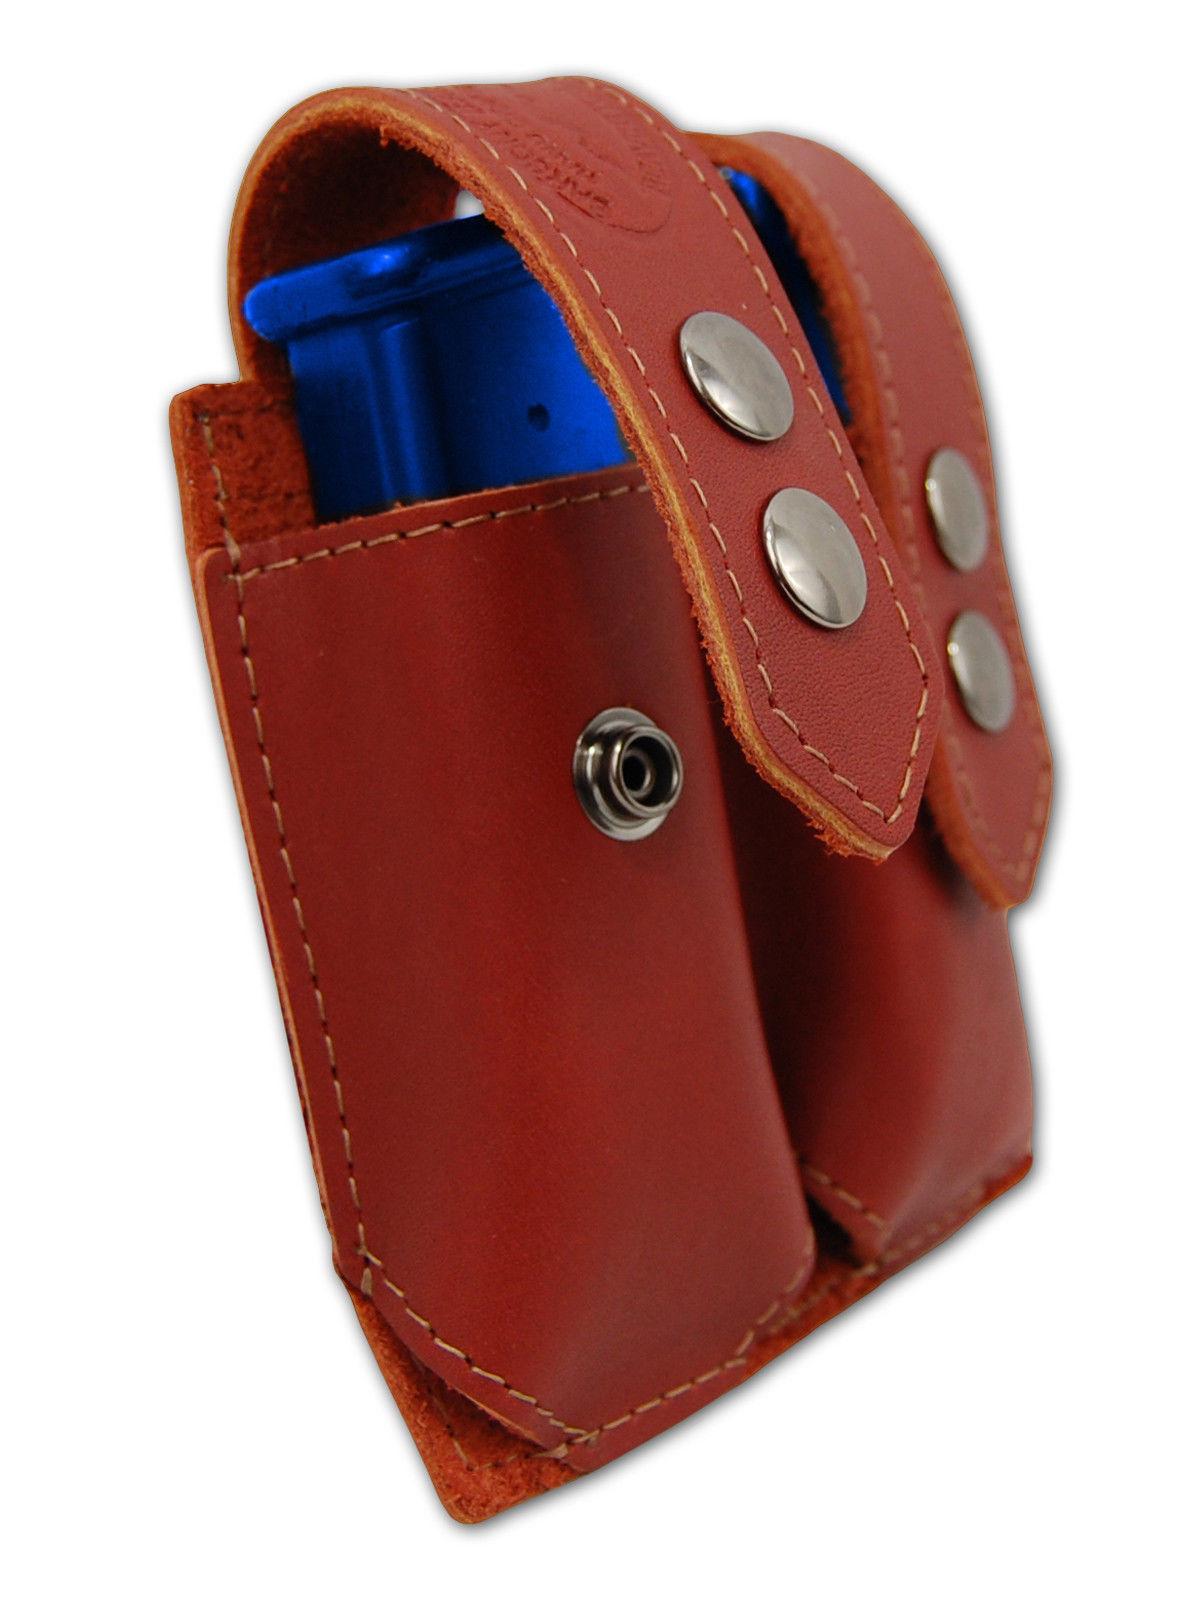 NEW Barsony Burgundy Leather Dbl Mag Pouch Beretta Taurus Mini/Pocket 22 25 380